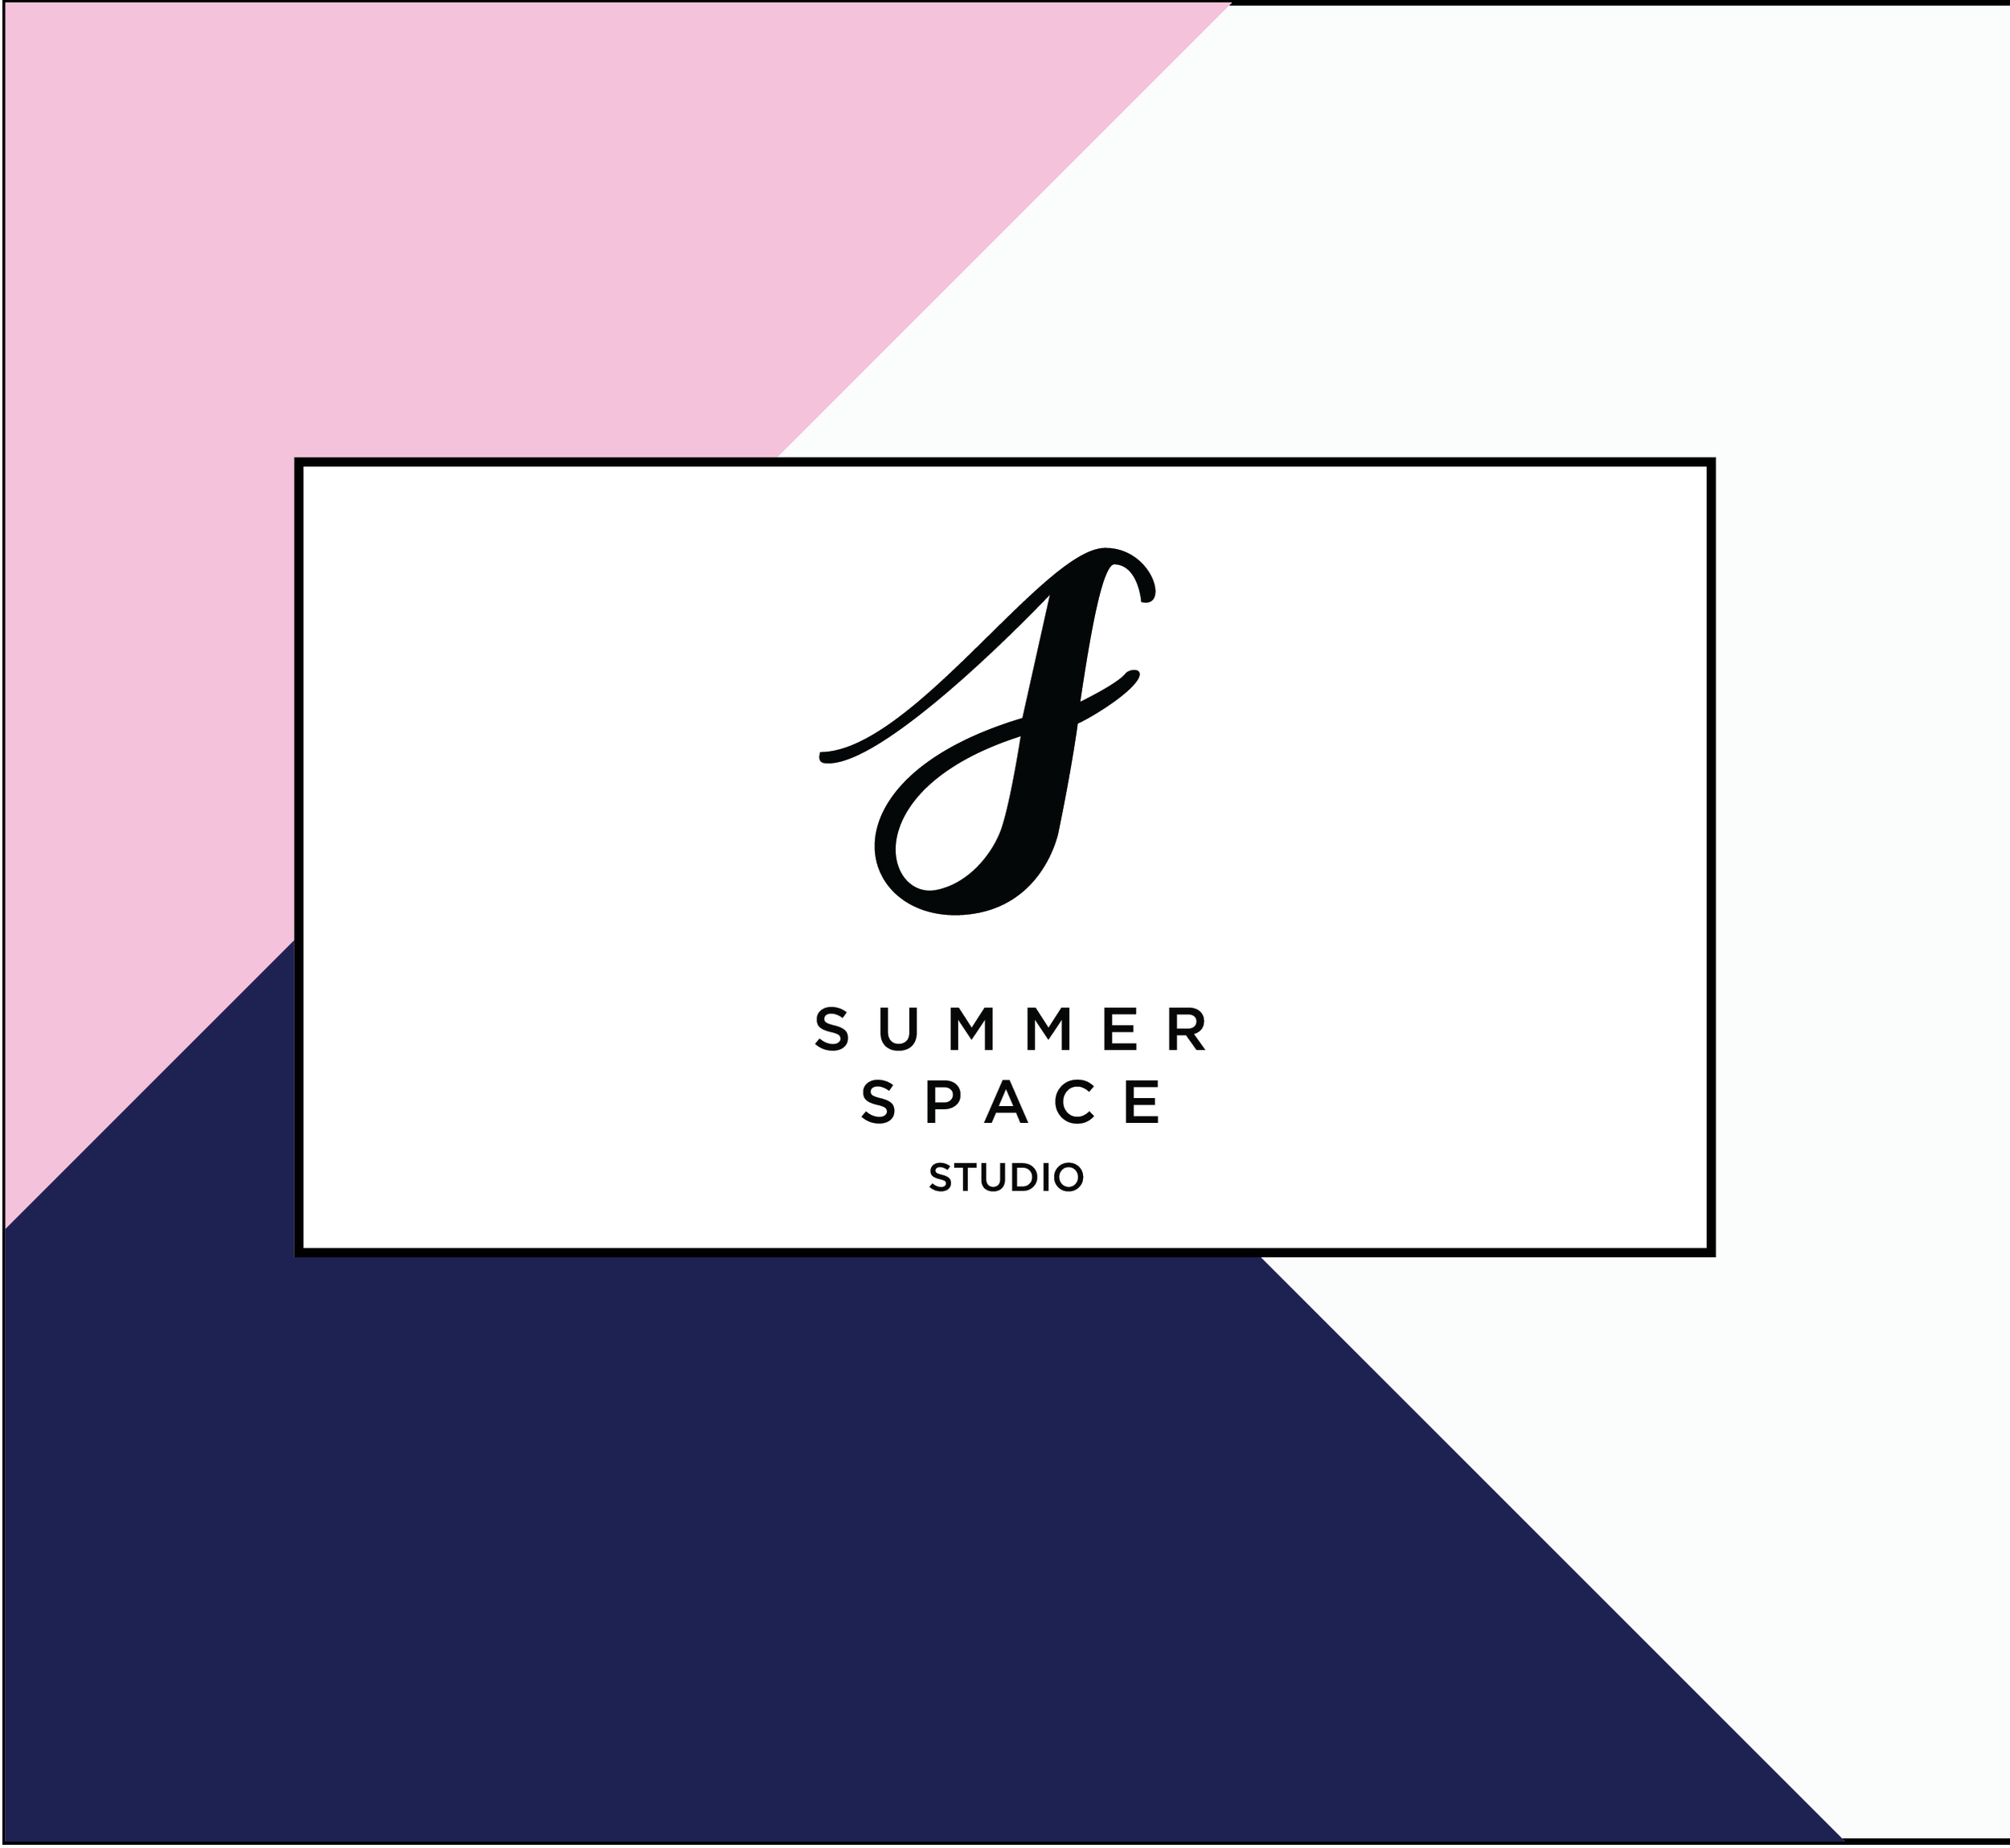 SS_logo_ig1-08.png